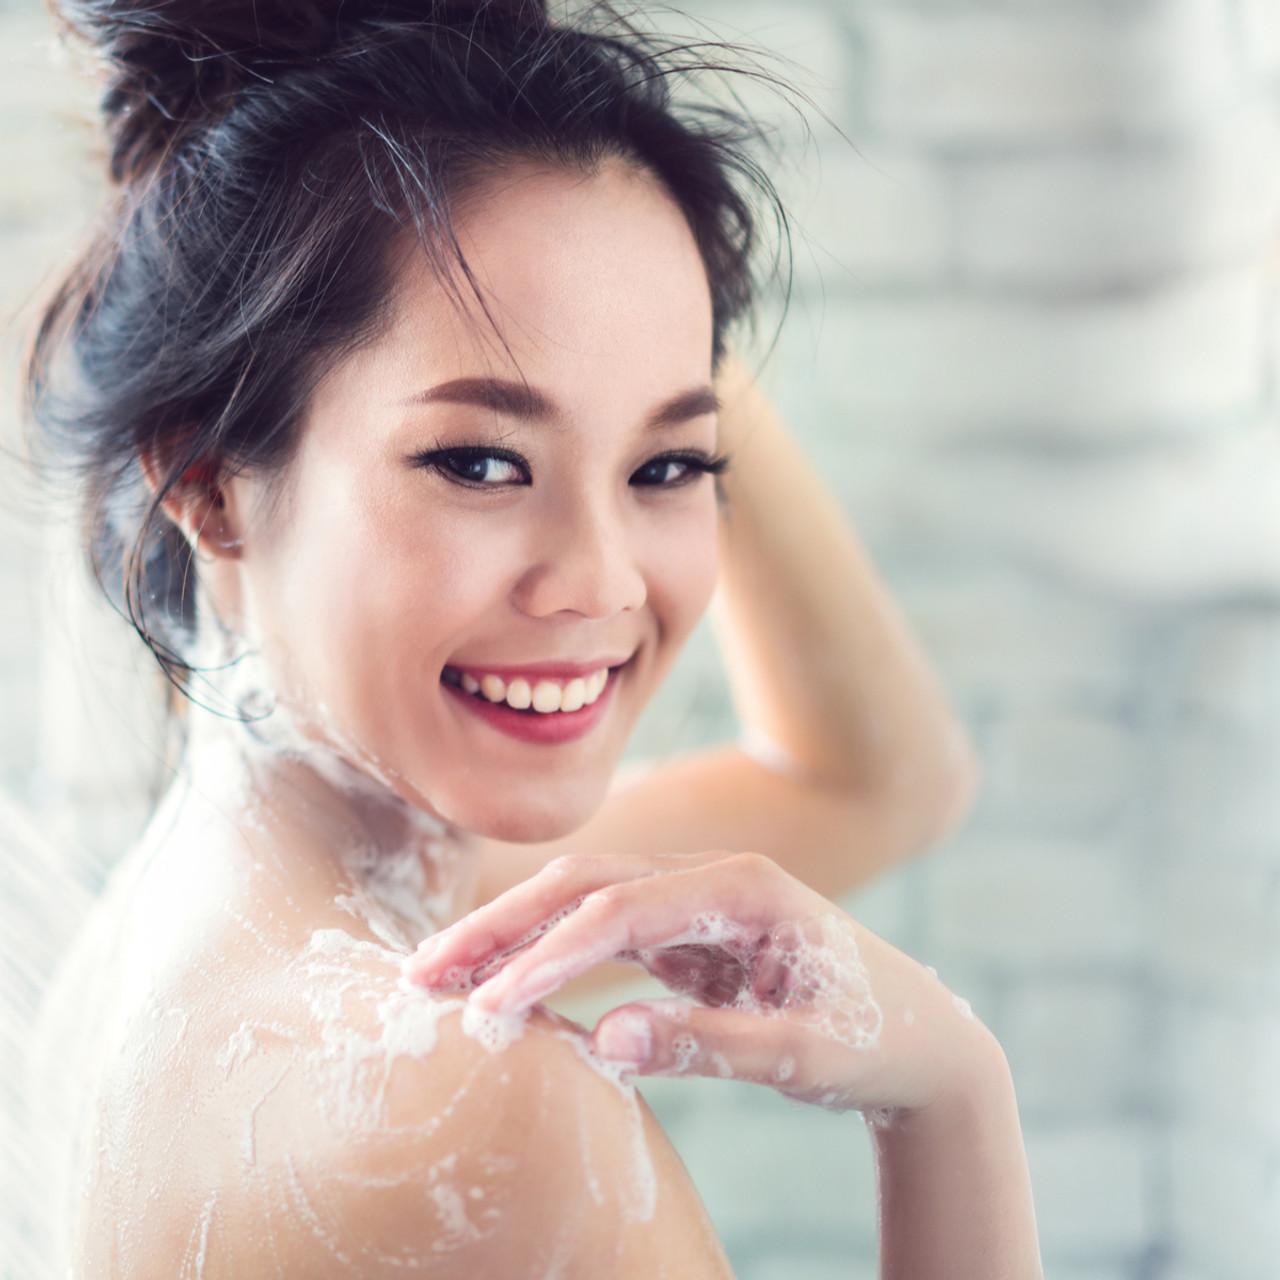 DAYSPA Body Basics Smoke Jumper | Pine Tar Handmade Bar Soap for Eczema/Acne Prone Sensitive Skin| Eco Friendly, 100% Vegan, Cold Processed Castile Soap, Handmade in USA in Small Batches